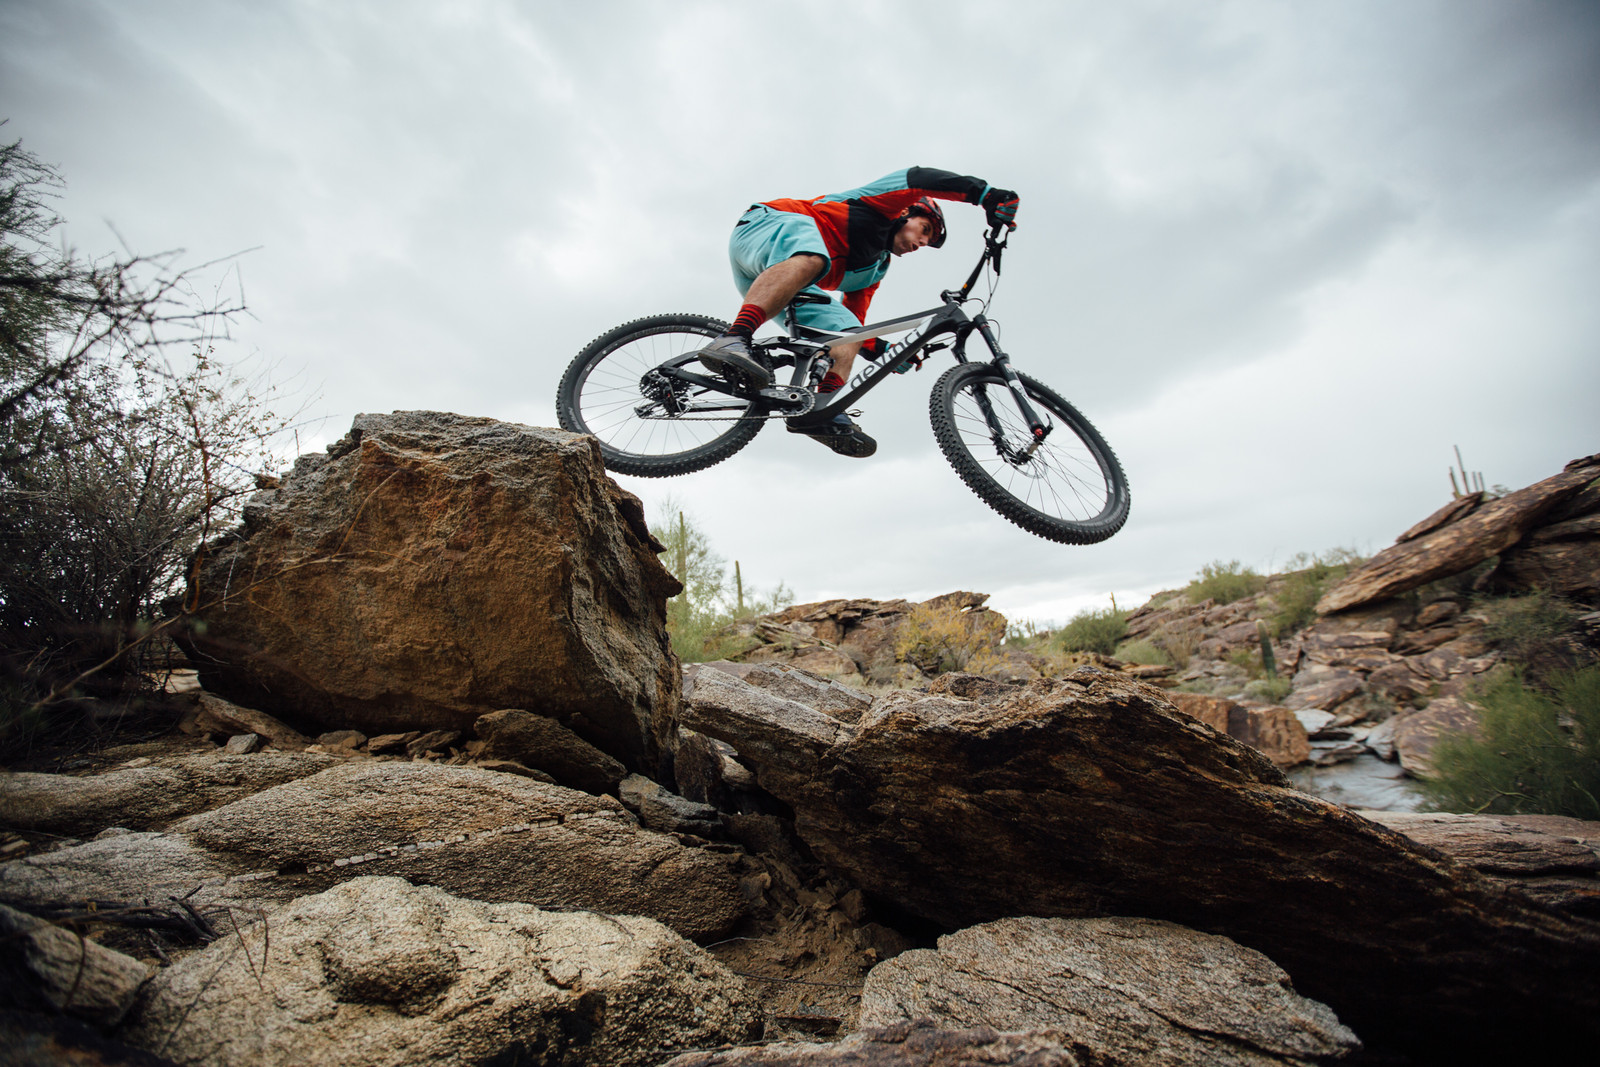 Just The Bangers - 2016 Vital MTB Test Sessions Photo Gallery - Just The Bangers - 2016 Vital MTB Test Sessions Photo Gallery - Mountain Biking Pictures - Vital MTB